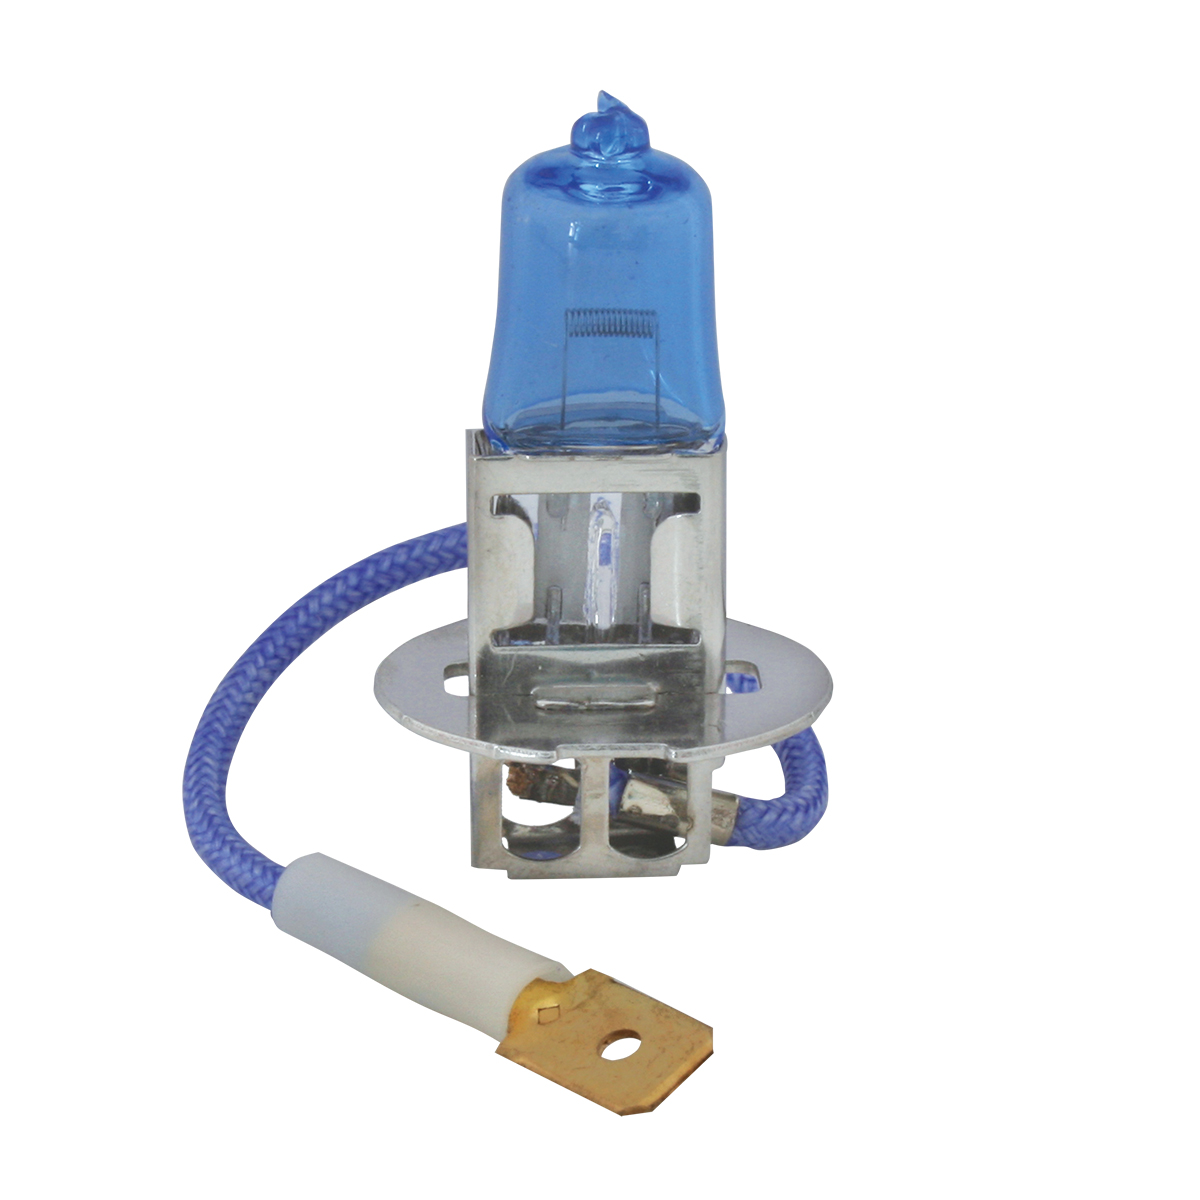 1157 socket wiring diagram  1157  get free image about